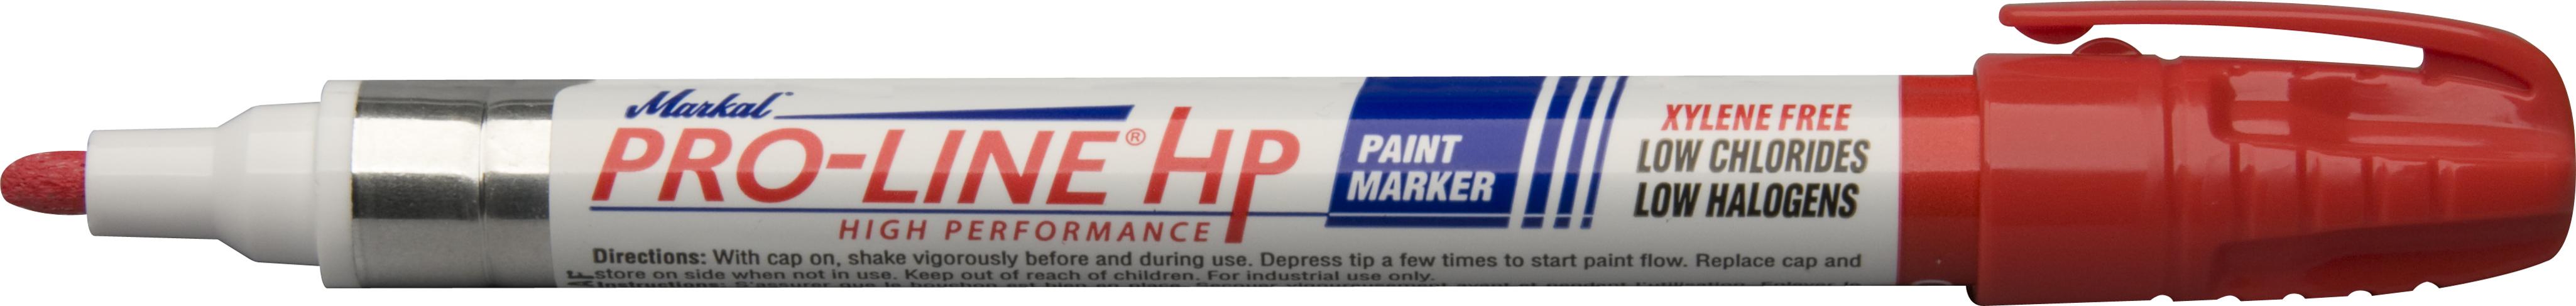 Markal Pro Line HP Paint Marker - Light Blue